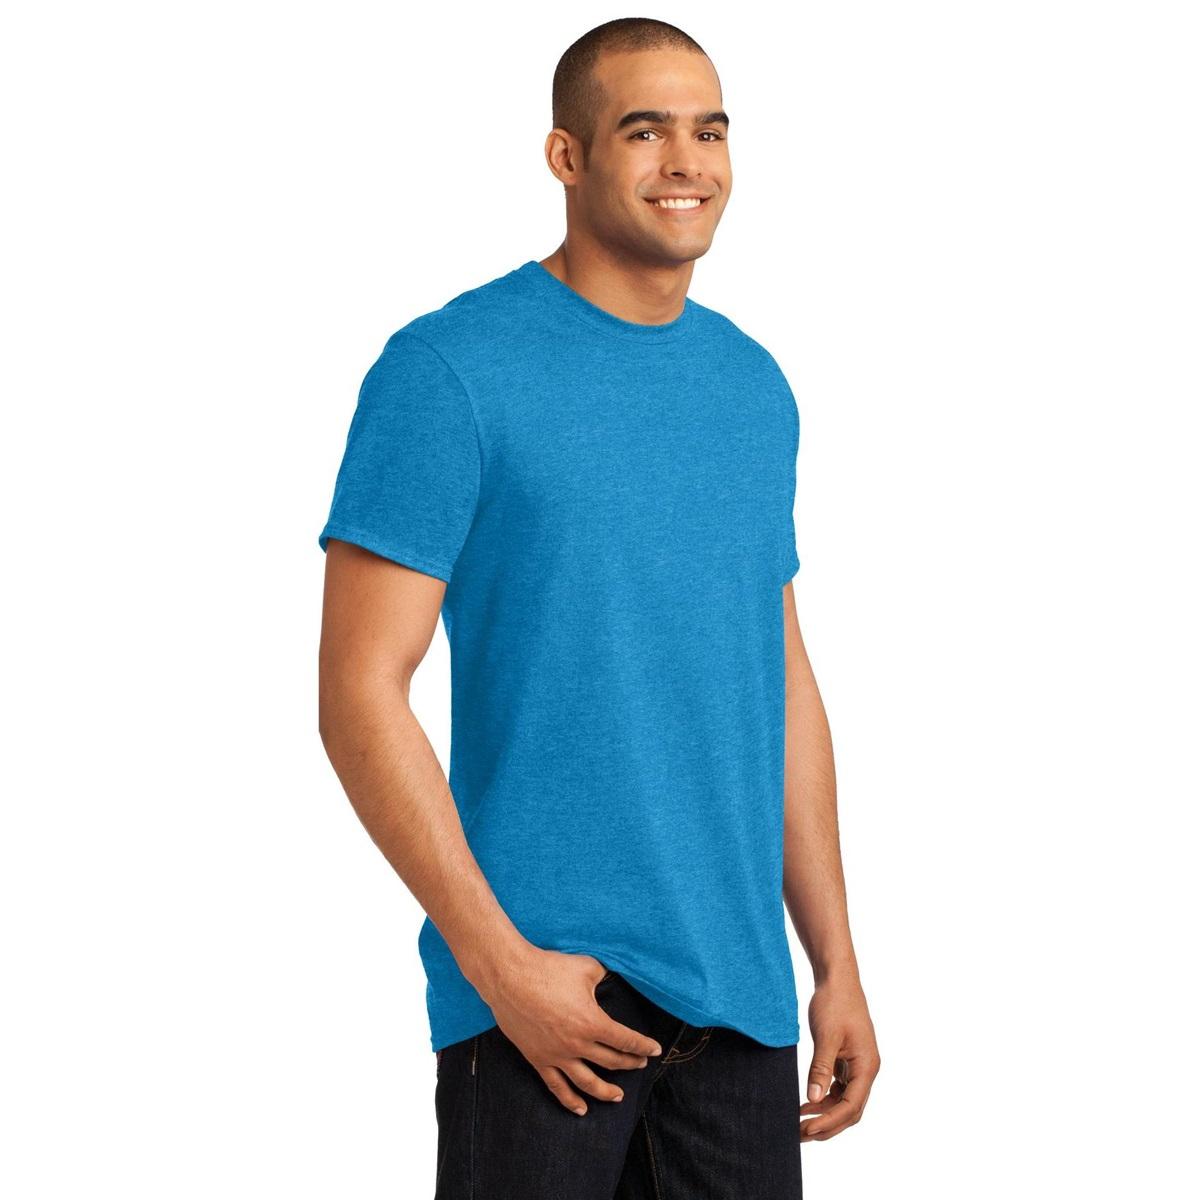 Hanes 4200 X-Temp T-Shirt - Neon Blue Heather | FullSource.com